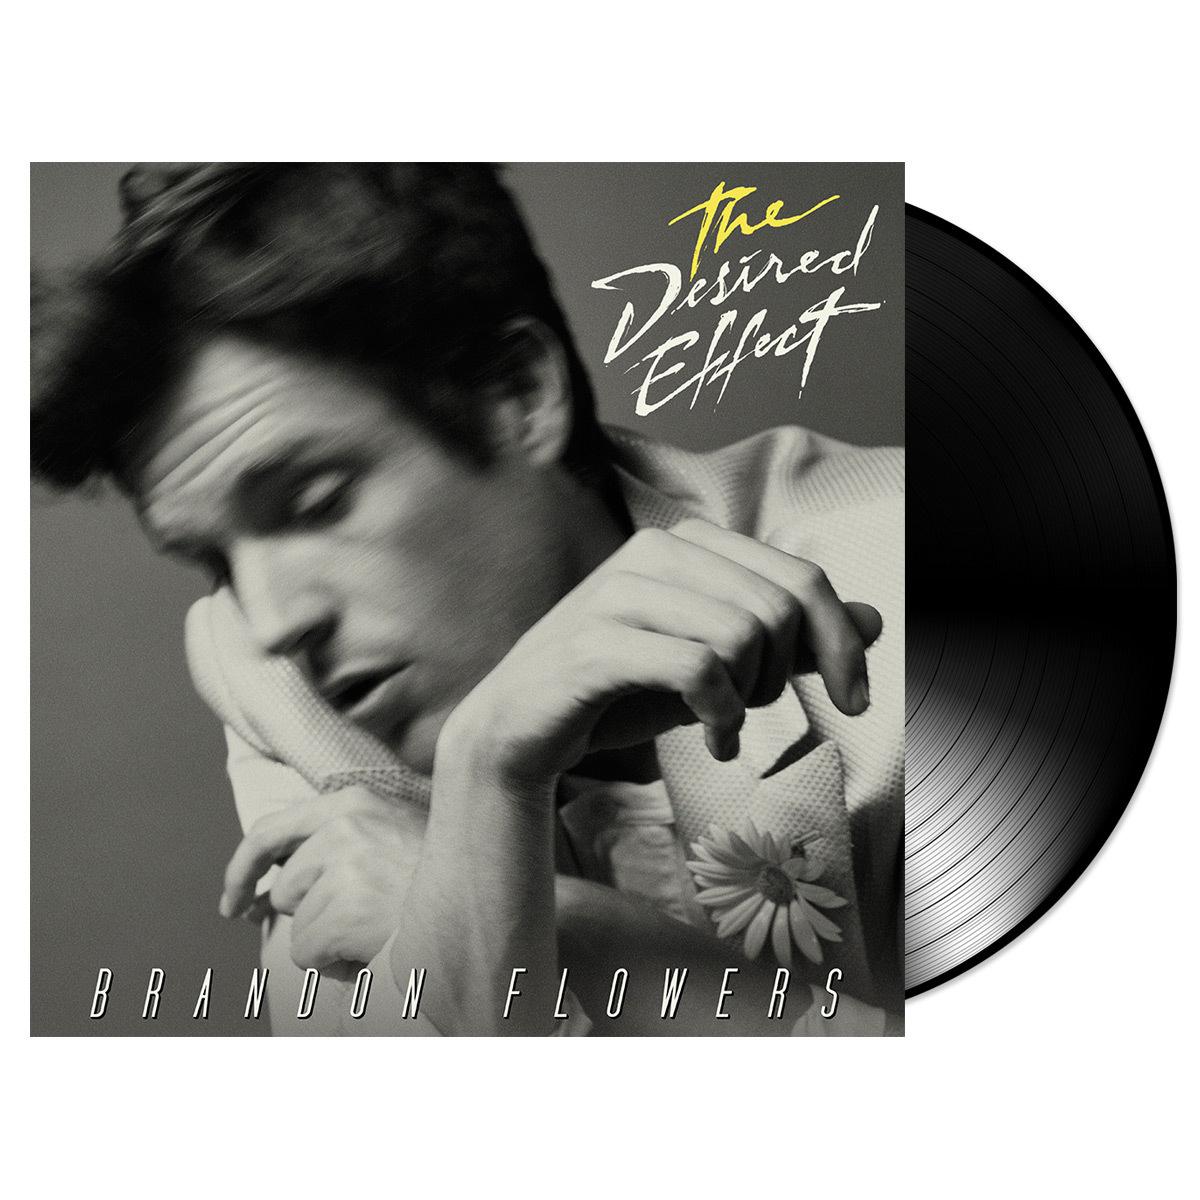 The Desired Effect Vinyl LP